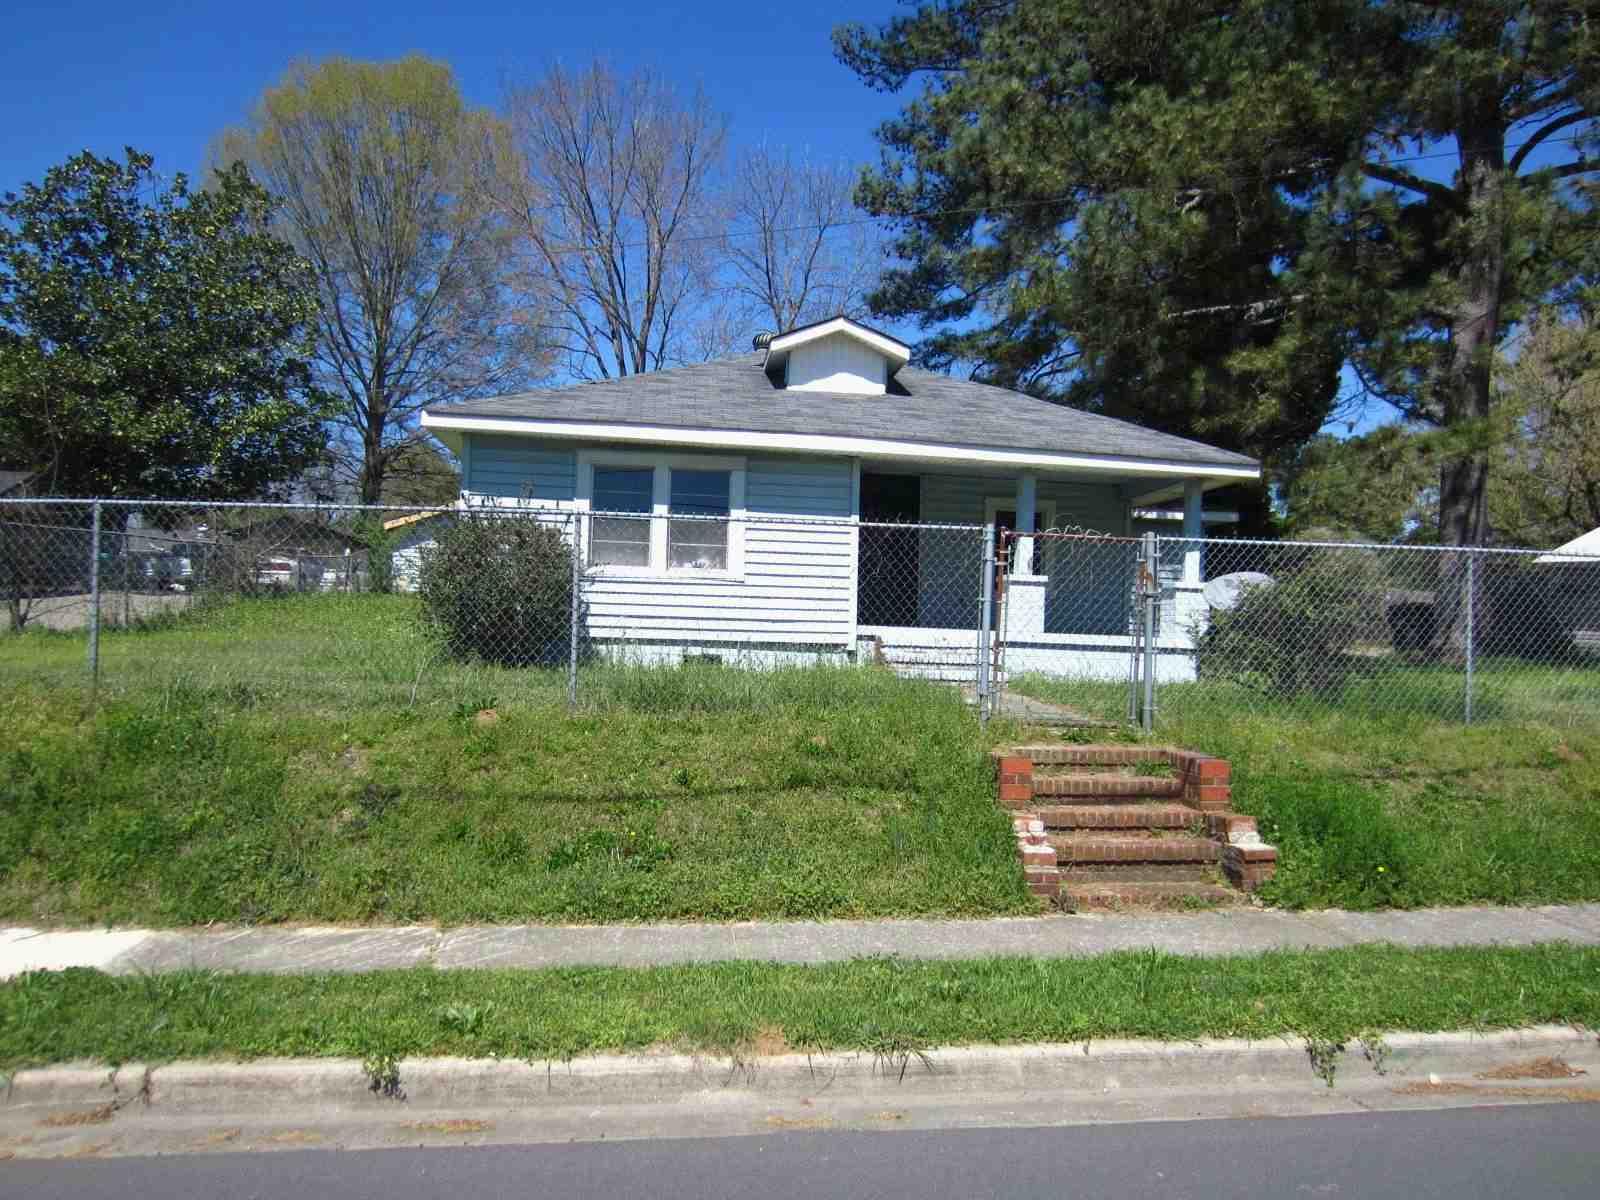 35160 foreclosures – 733 Howard St, Talladega, AL 35160